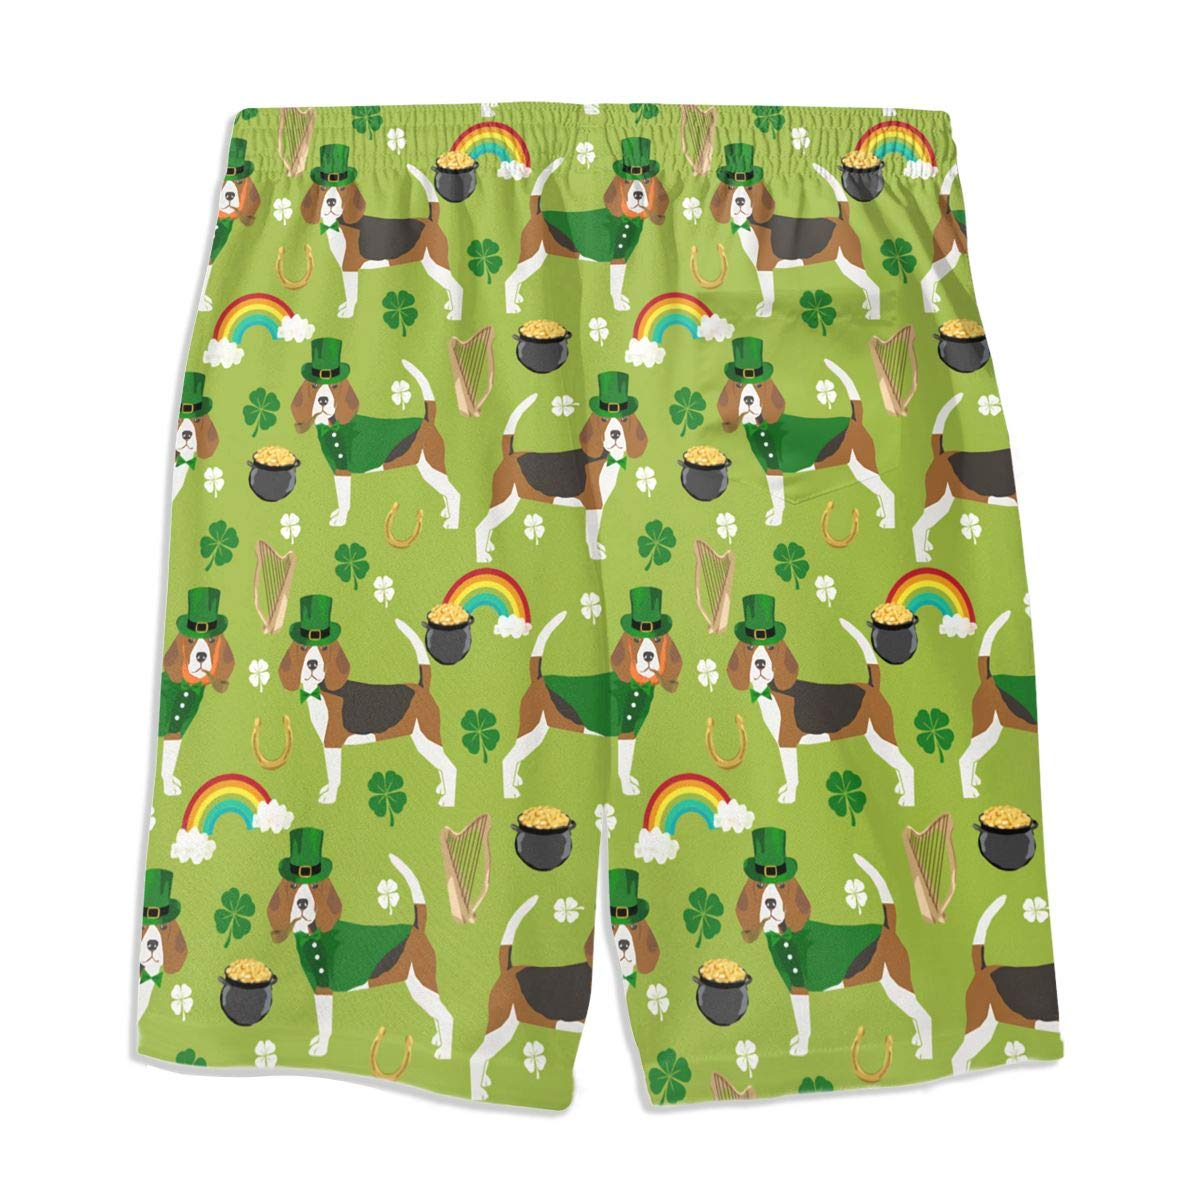 St Patricks Day Leprechaun Beagle Rainbow Green Teen Swim Trunks Bathing Suit Shorts Board Beach